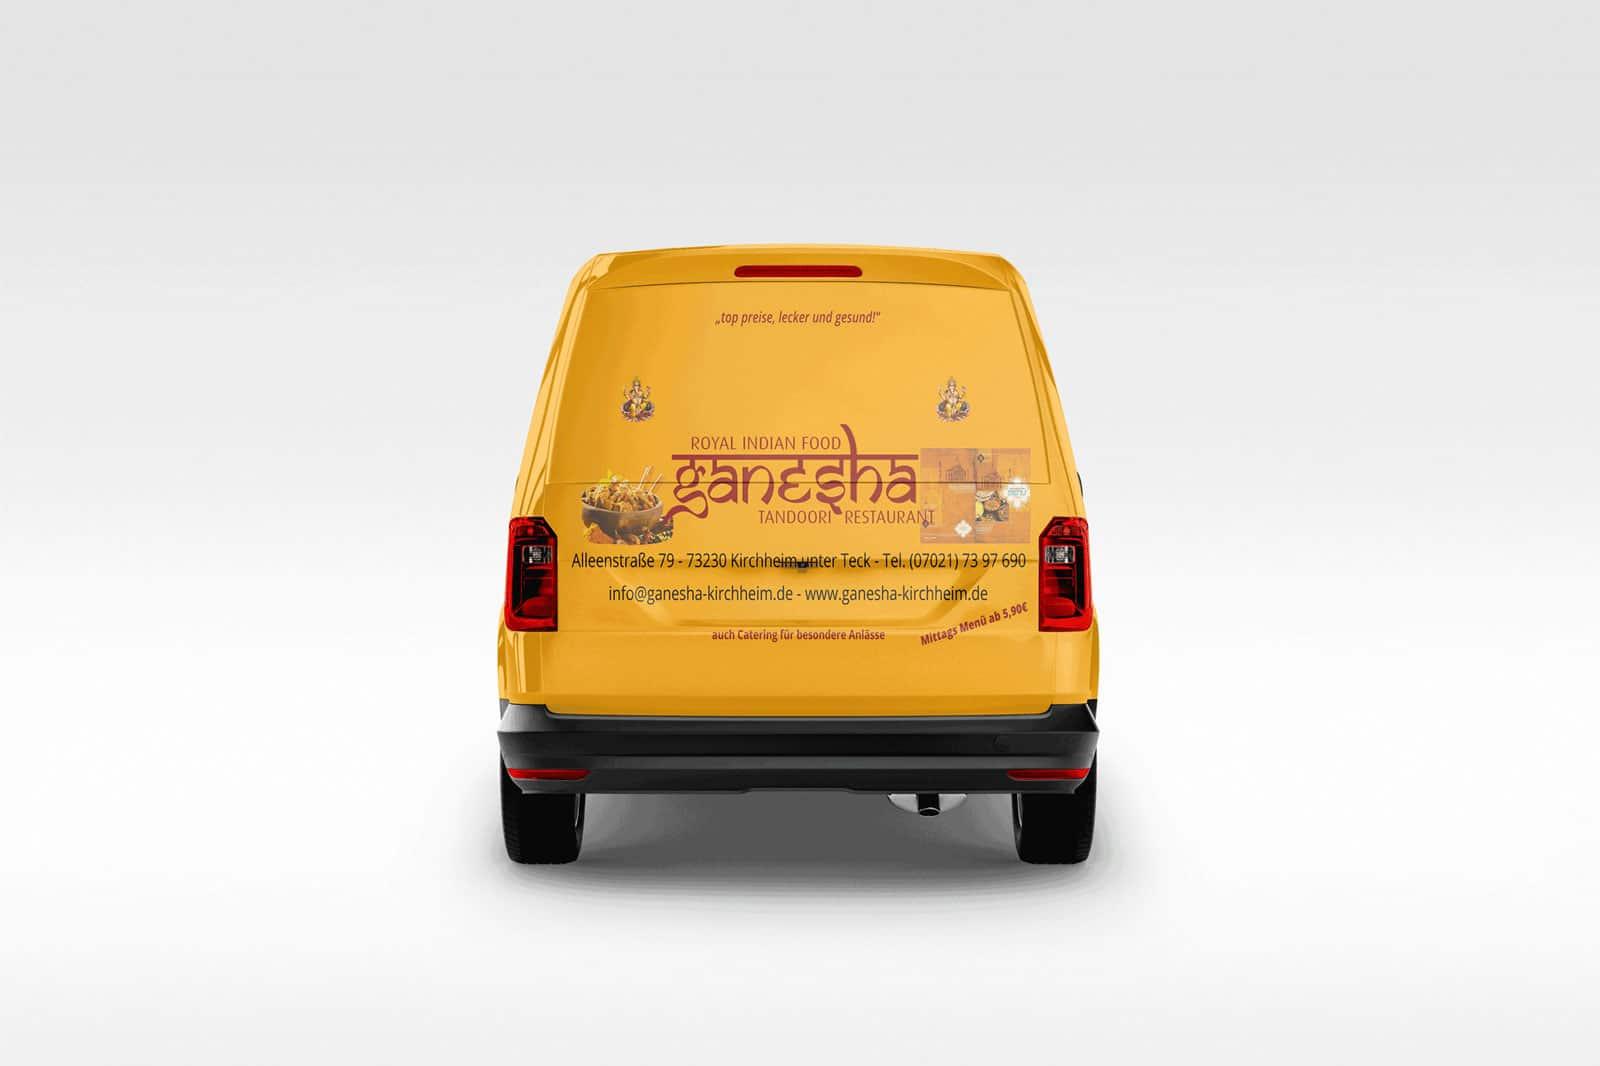 van-ganesha-kirchheim-indisch-essen-busbeklebung-grafik-liebespixel-webdesign-logo-print